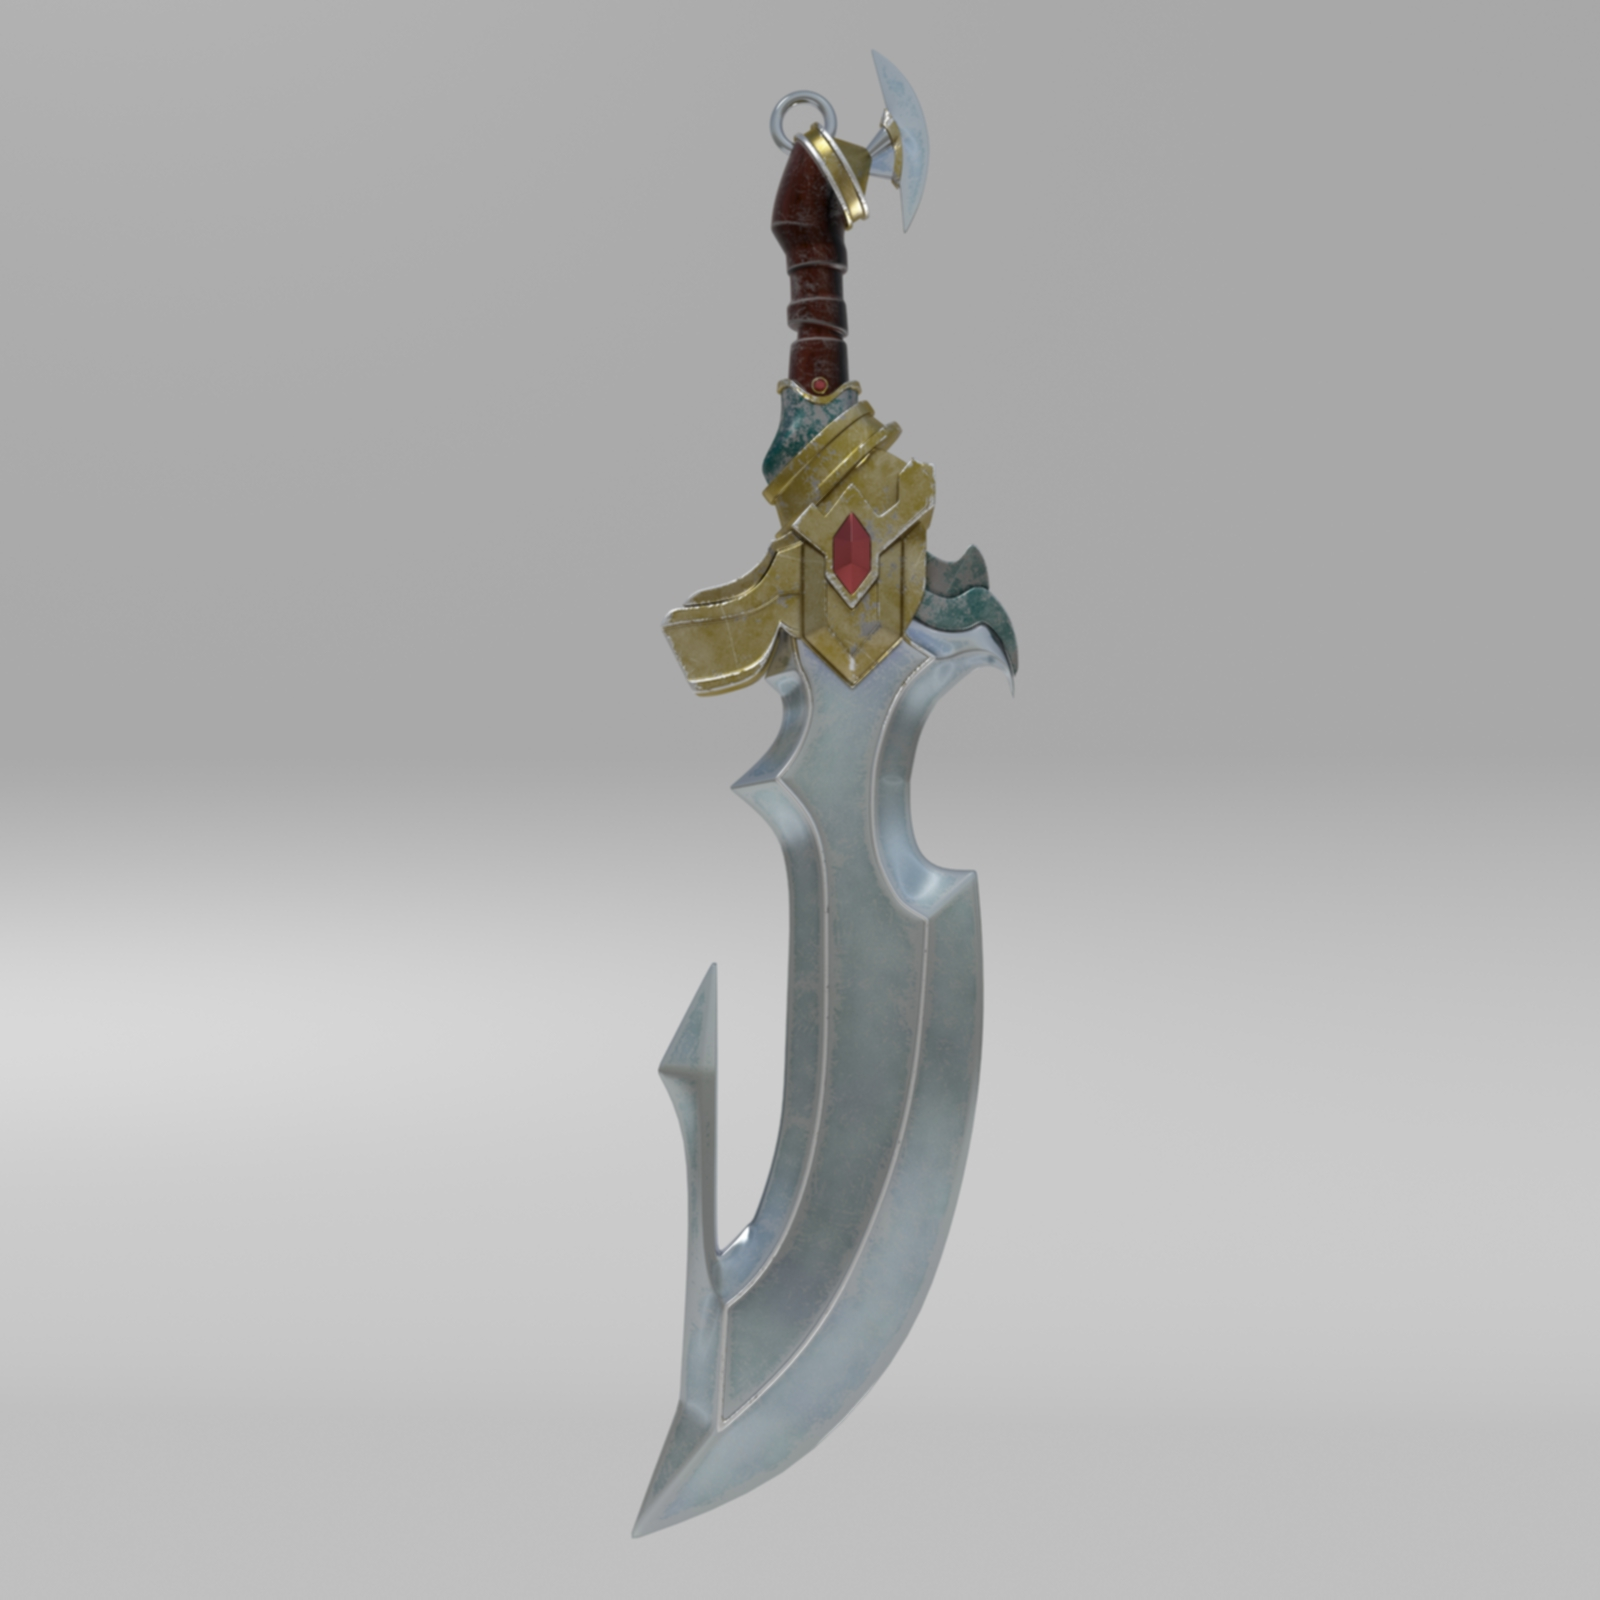 Fantasy Sword 4 By Nicu Tepes 3docean